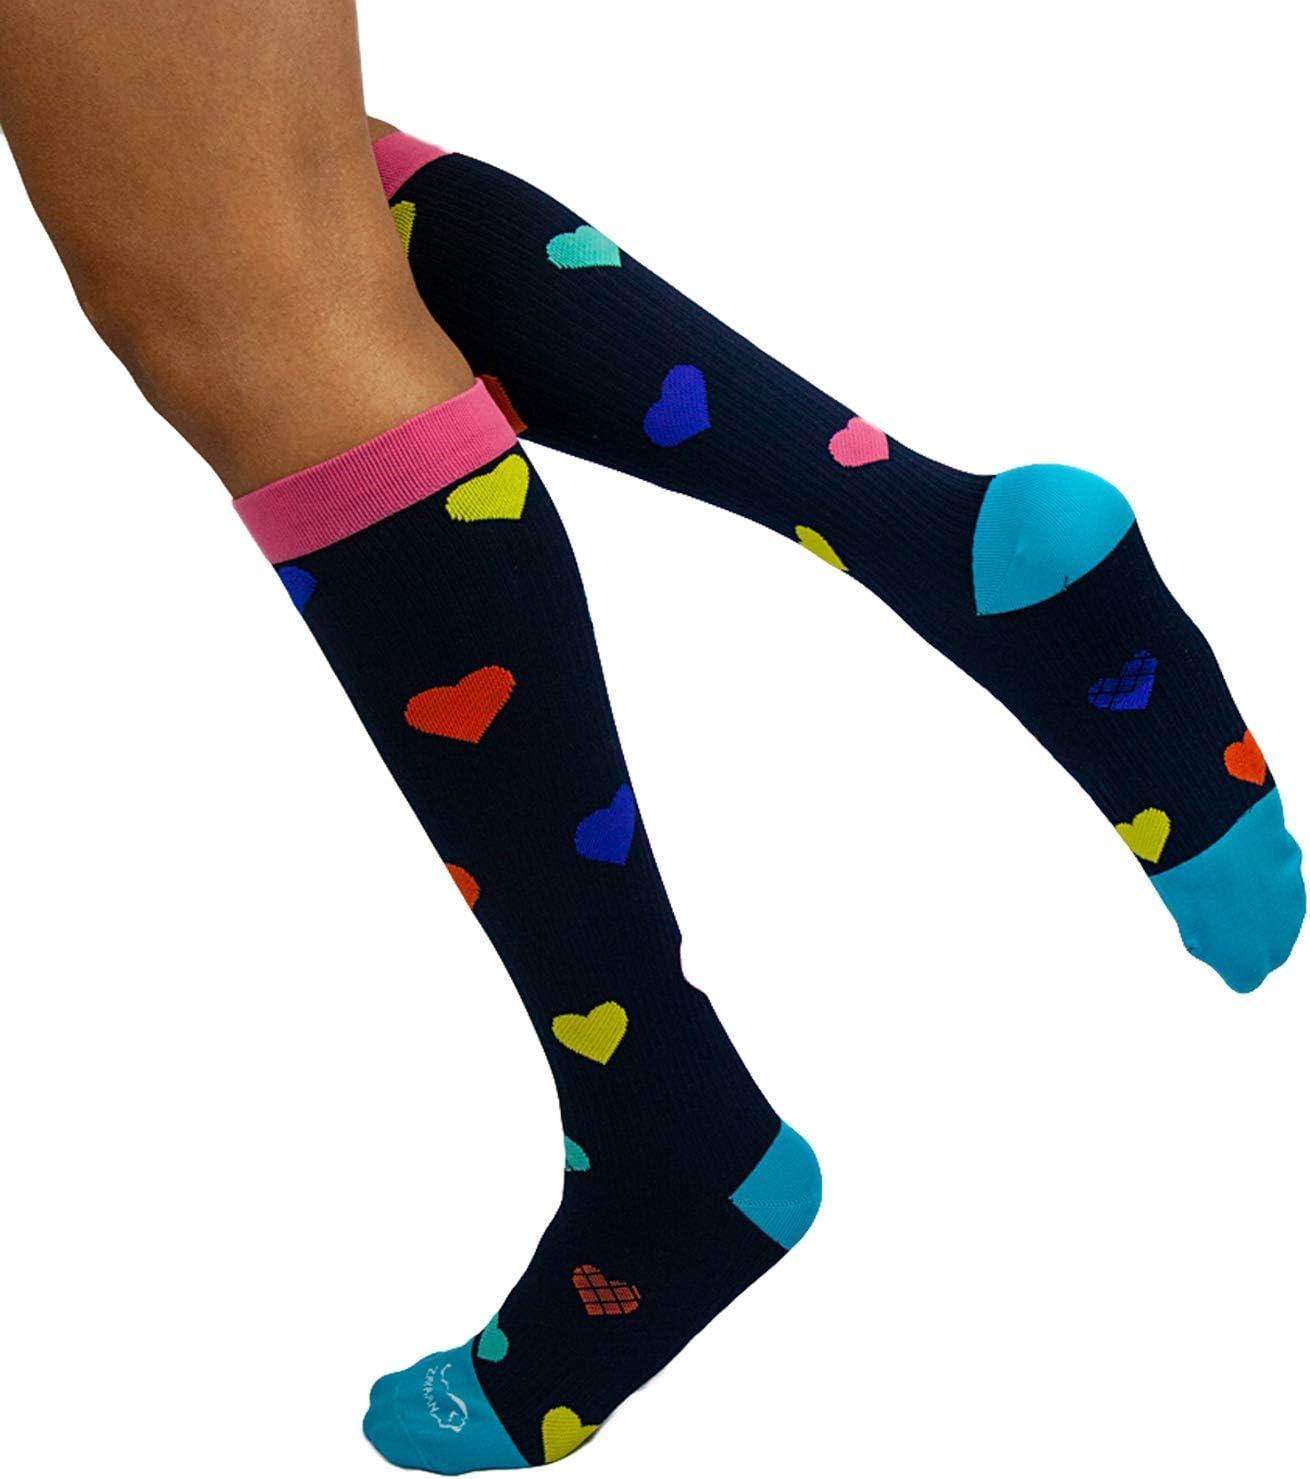 ZAYAAN Sale HEALTH Heart Compression National uniform free shipping Socks Hg 15-20 Anti-Fatig mm